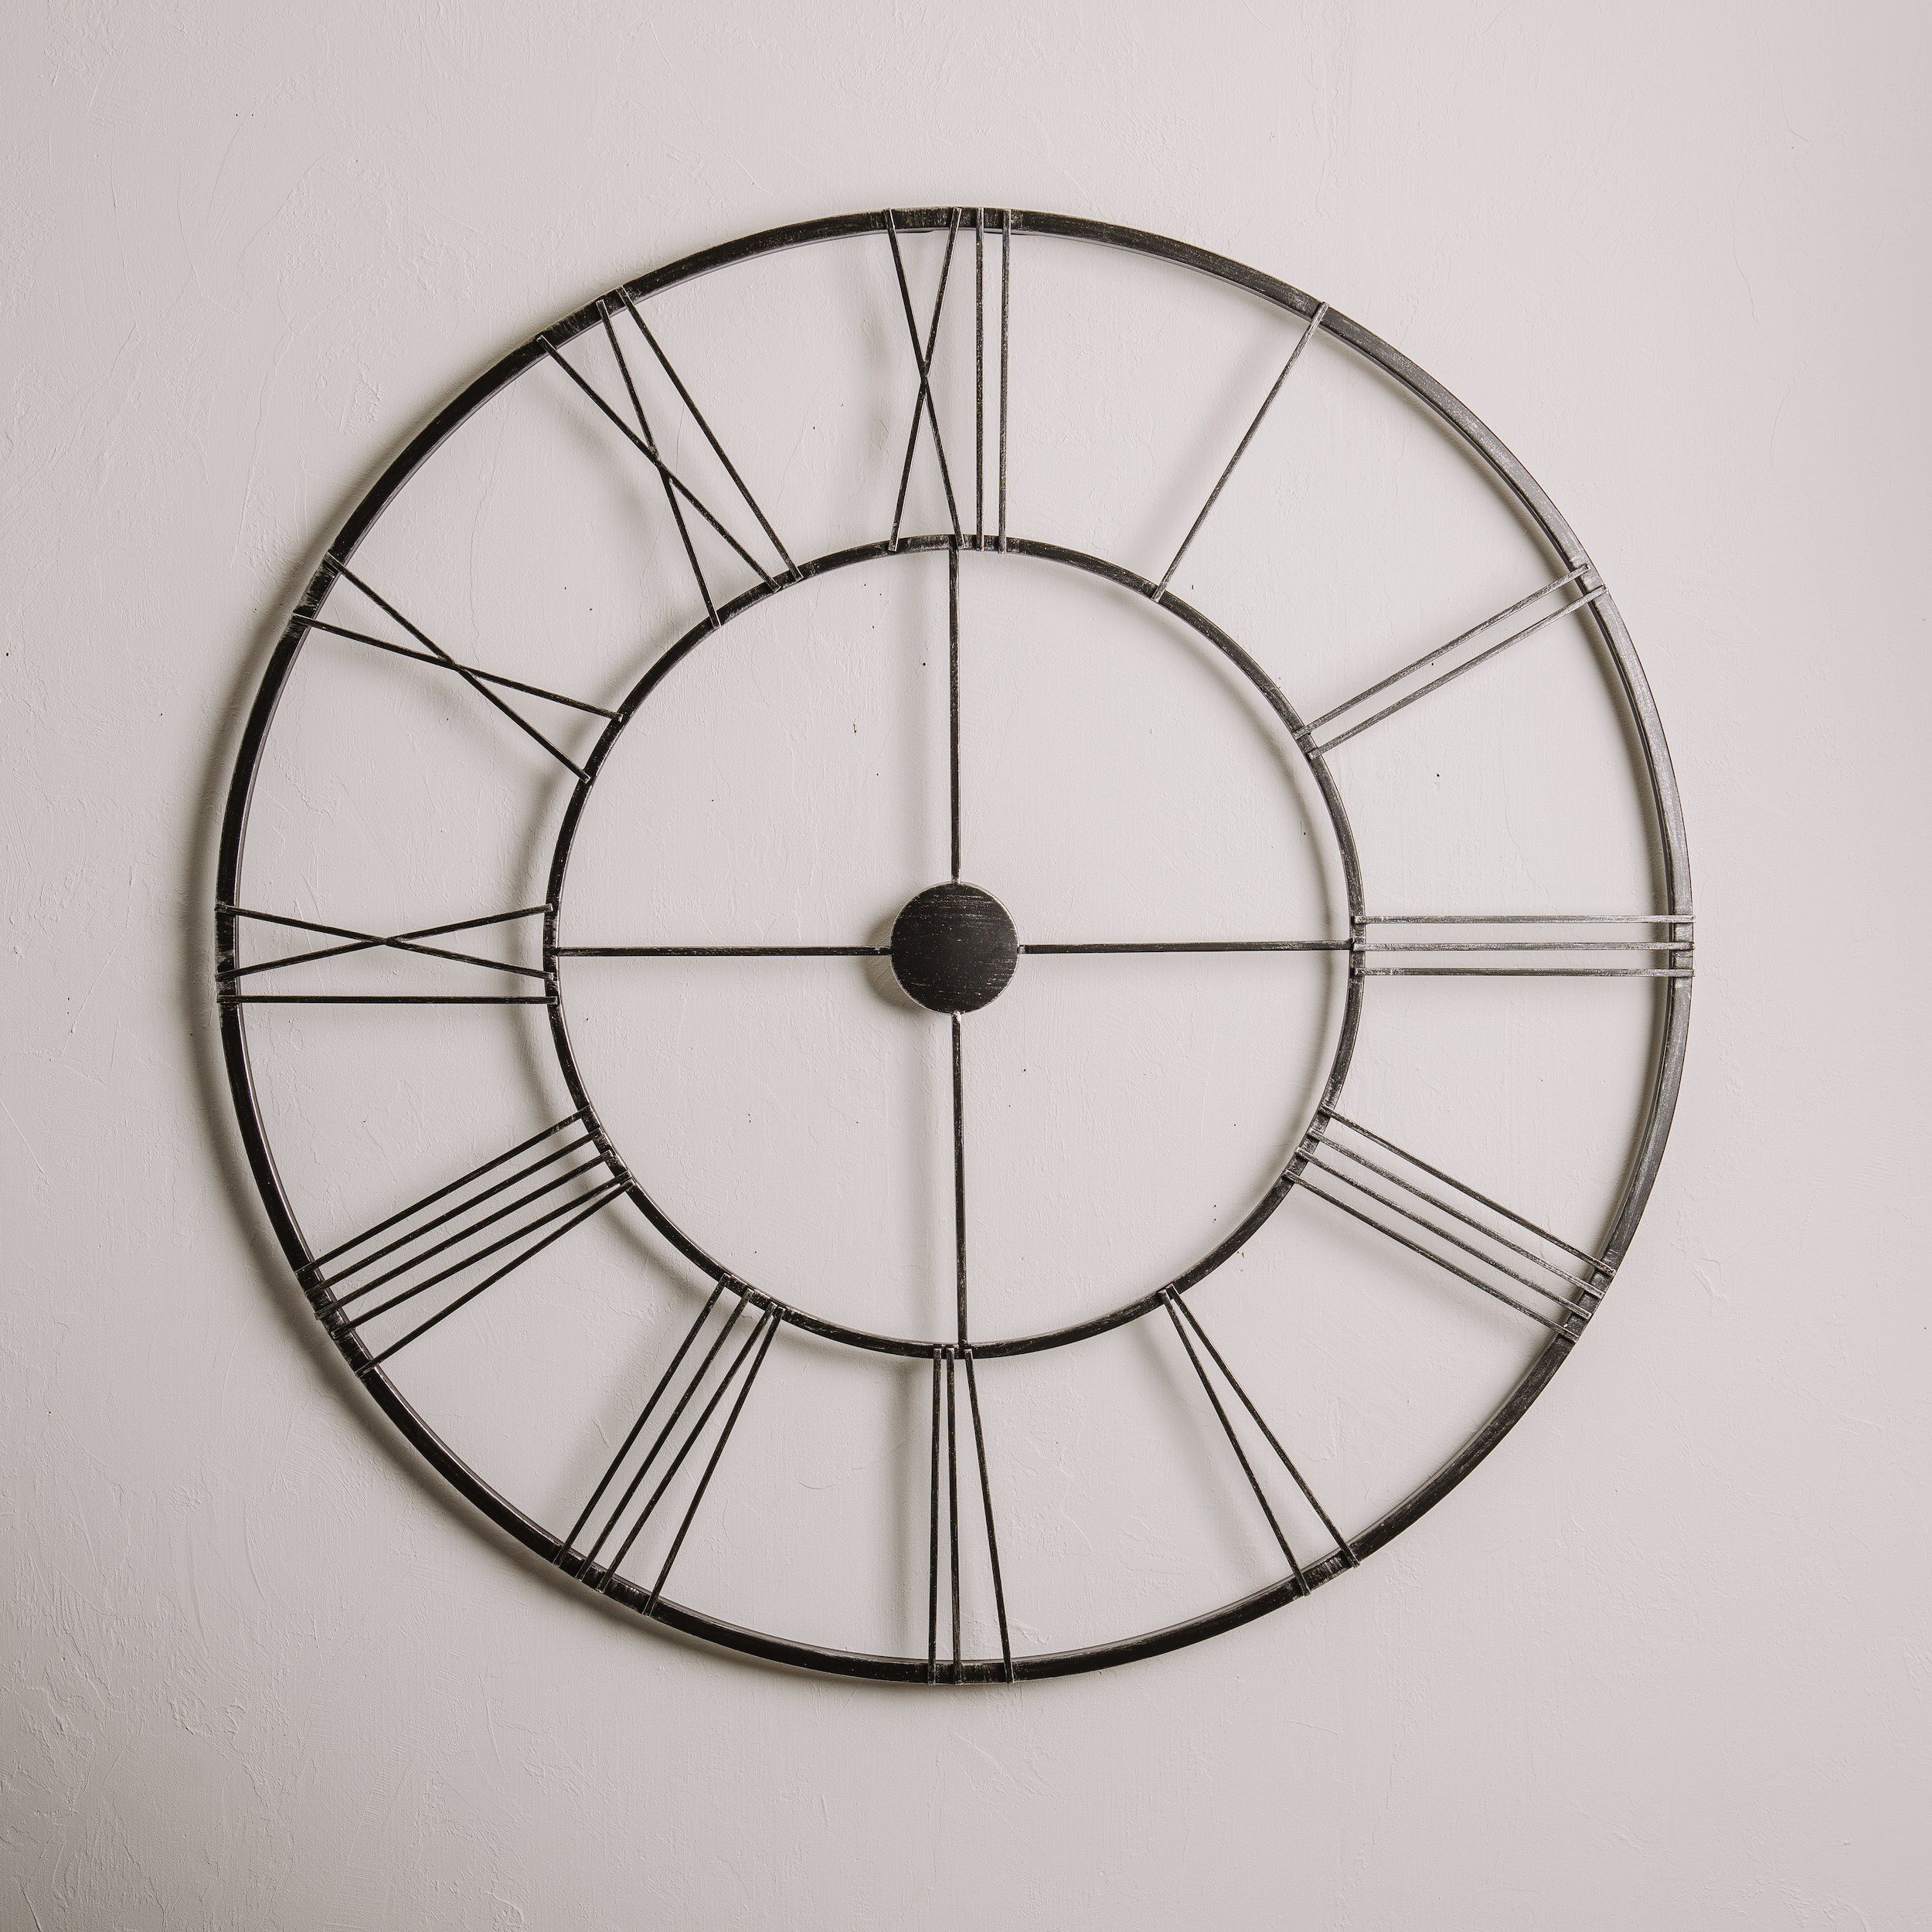 Infinity Clock Frame | Joanna gaines, Clocks and Hgtv